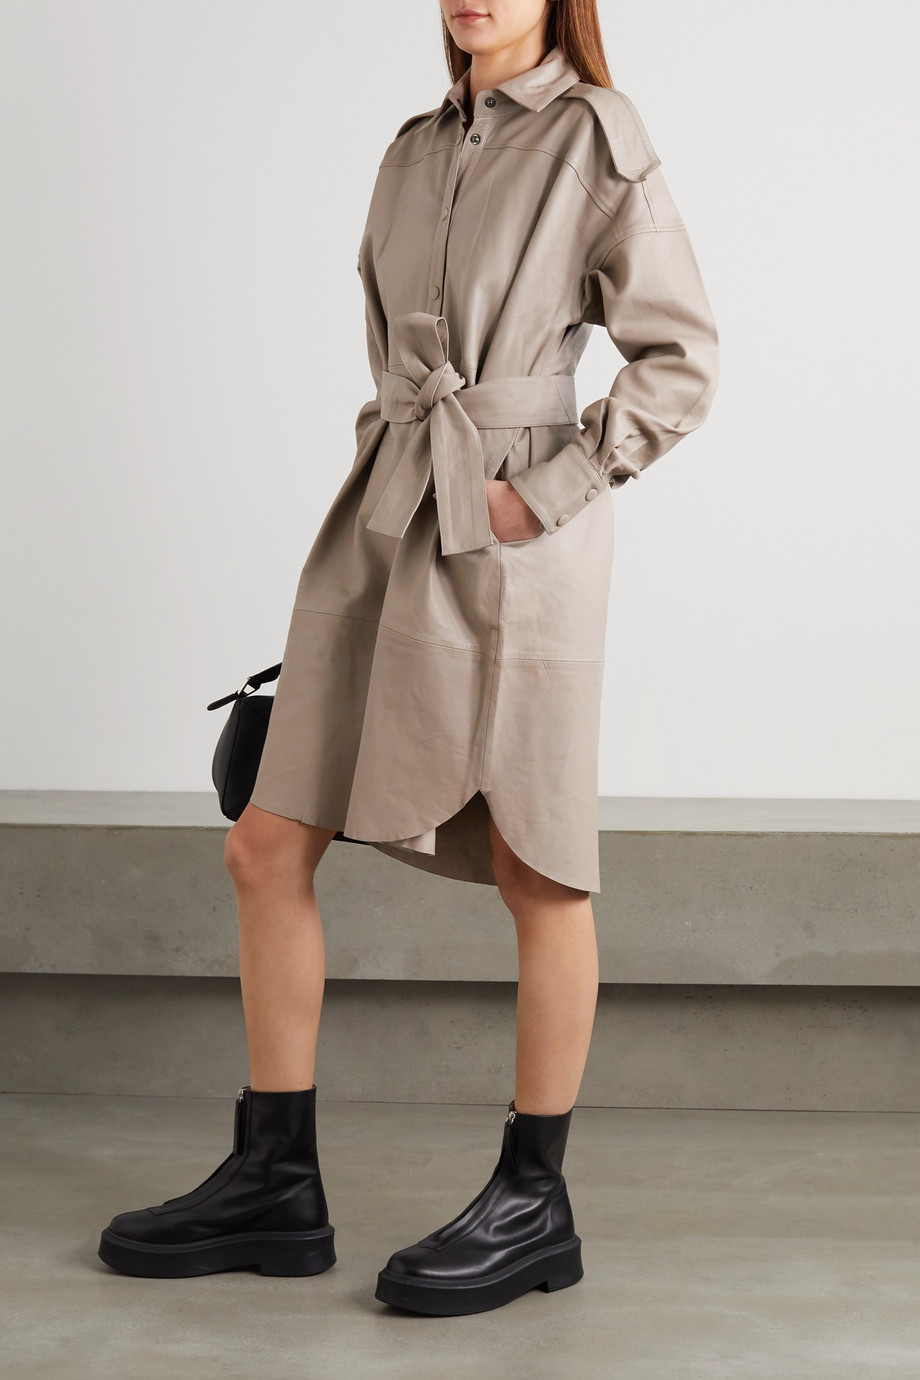 REMAIN Birger Christensen Lavare belted leather shirt dress